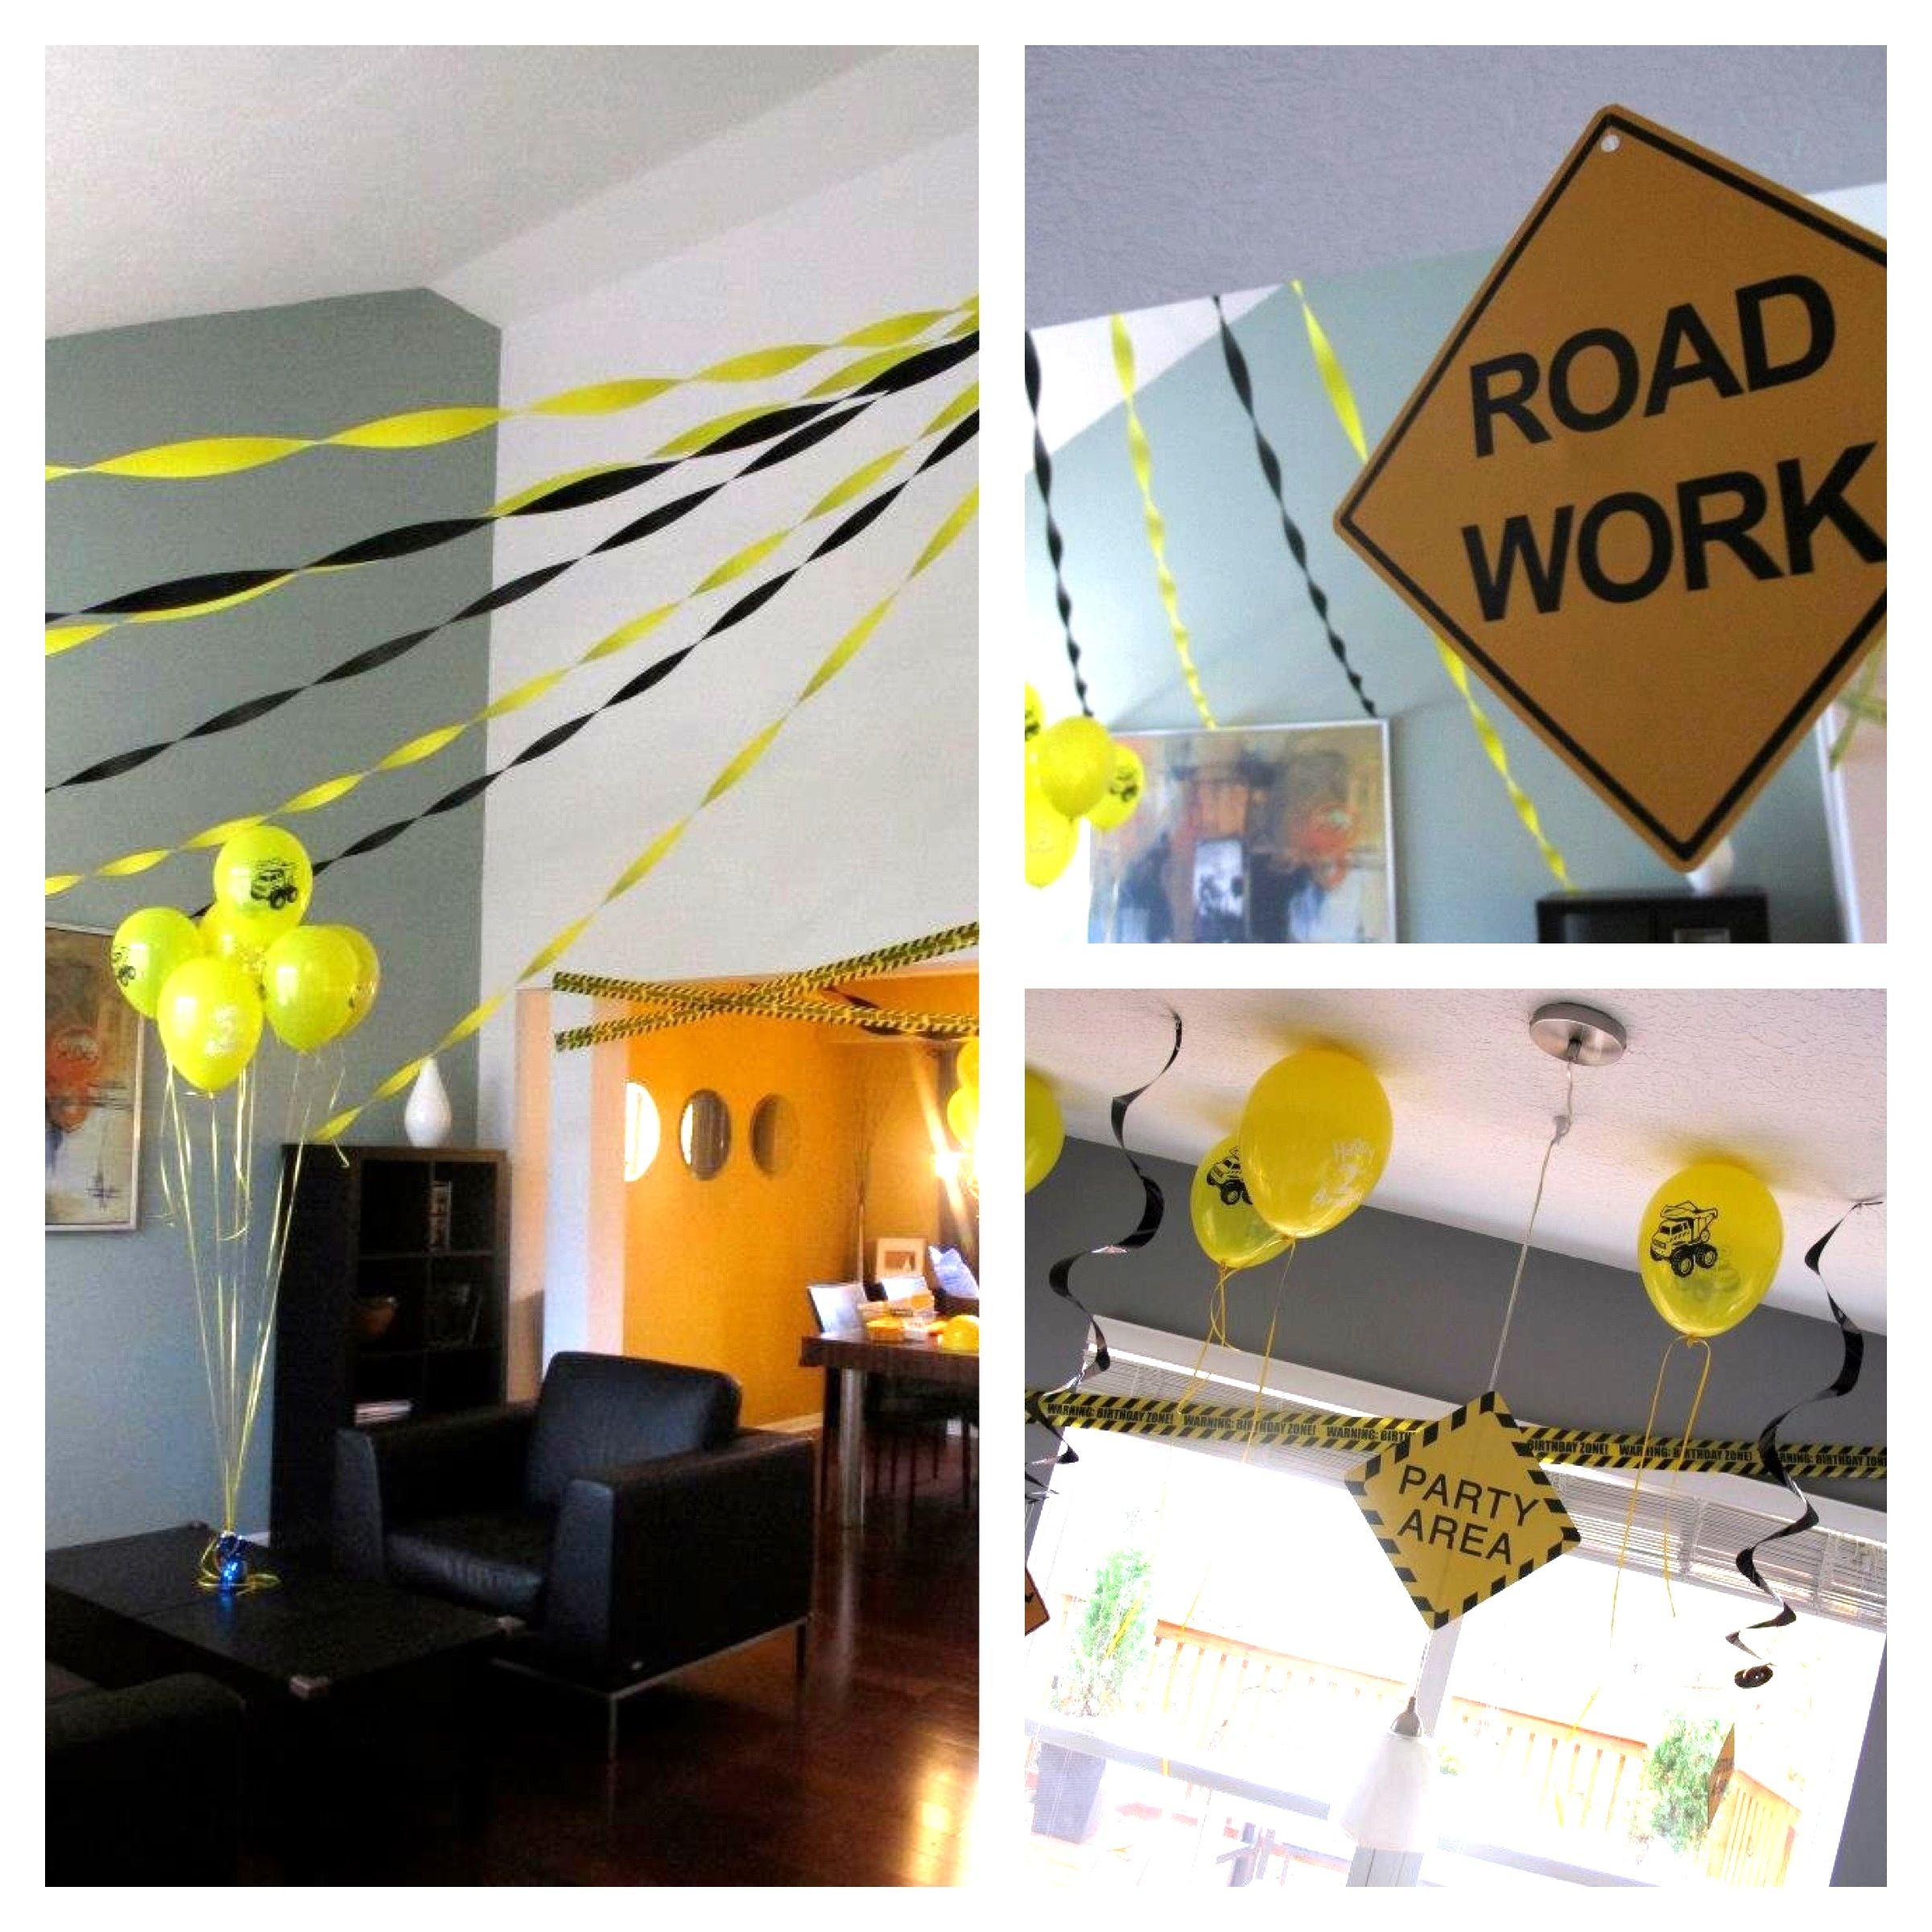 Construction party decoration ideas.  sc 1 st  Pinterest & Construction party decoration ideas. | Jasonu0027s 3rd birthday ideas ...